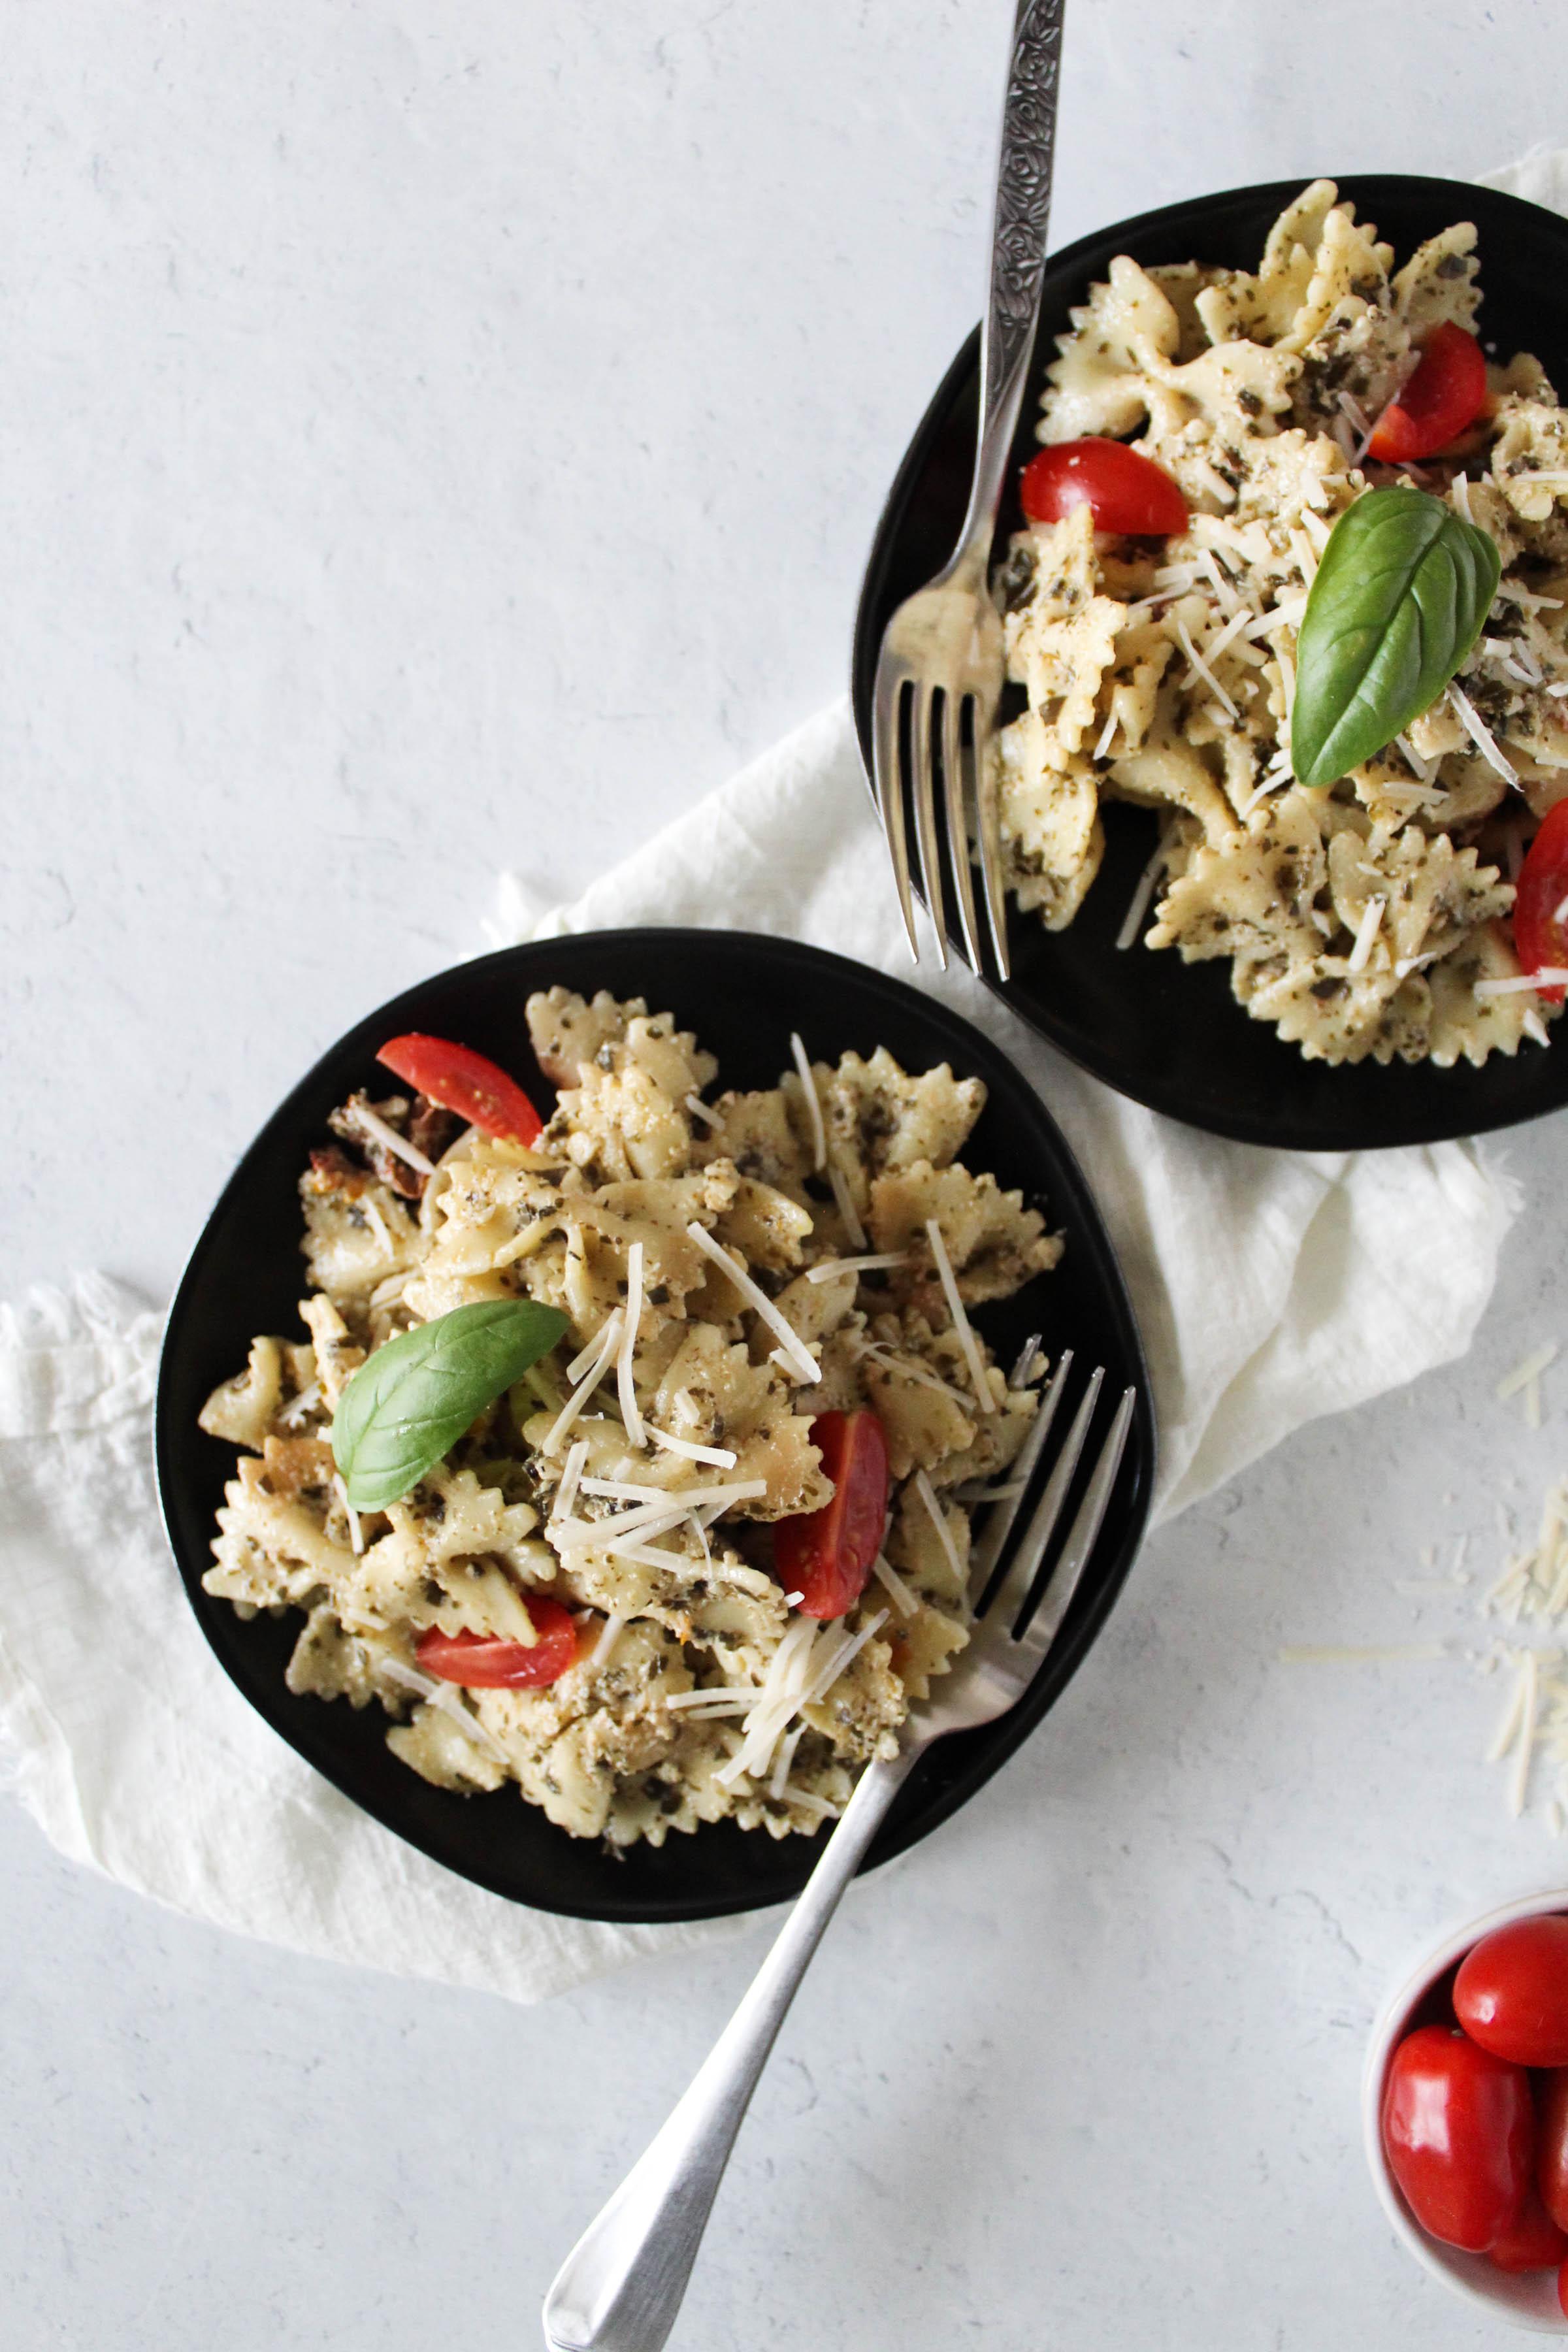 Overhead view of pesto pasta in plates.